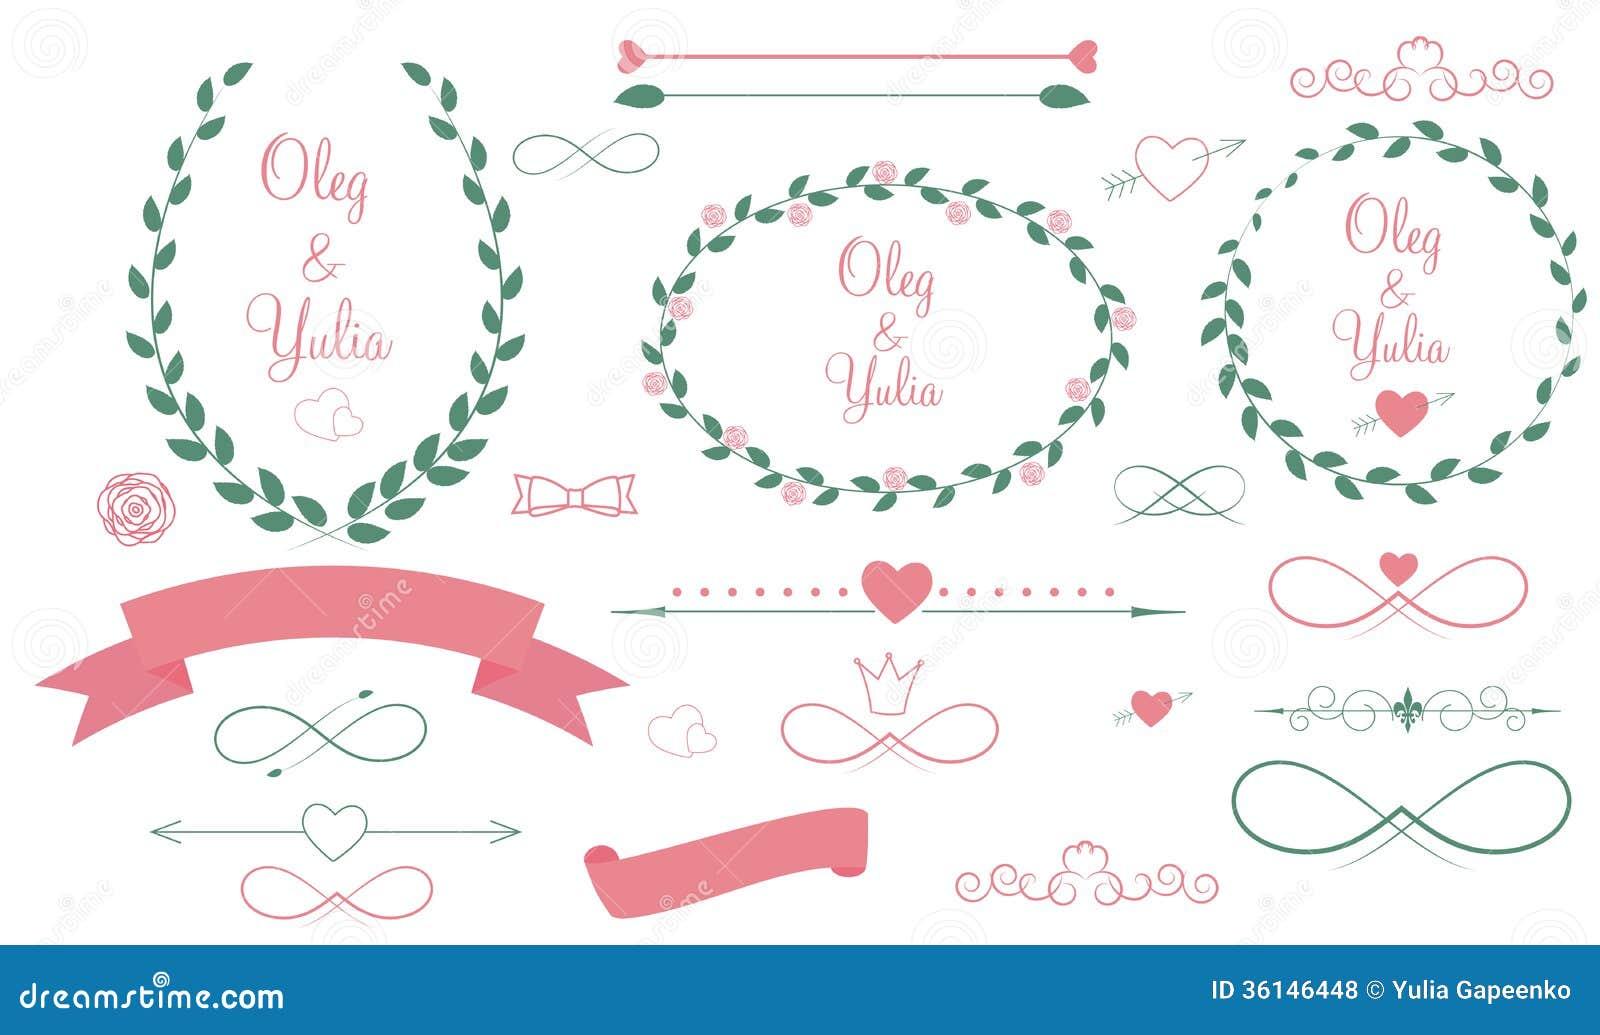 free vector clipart wedding - photo #16